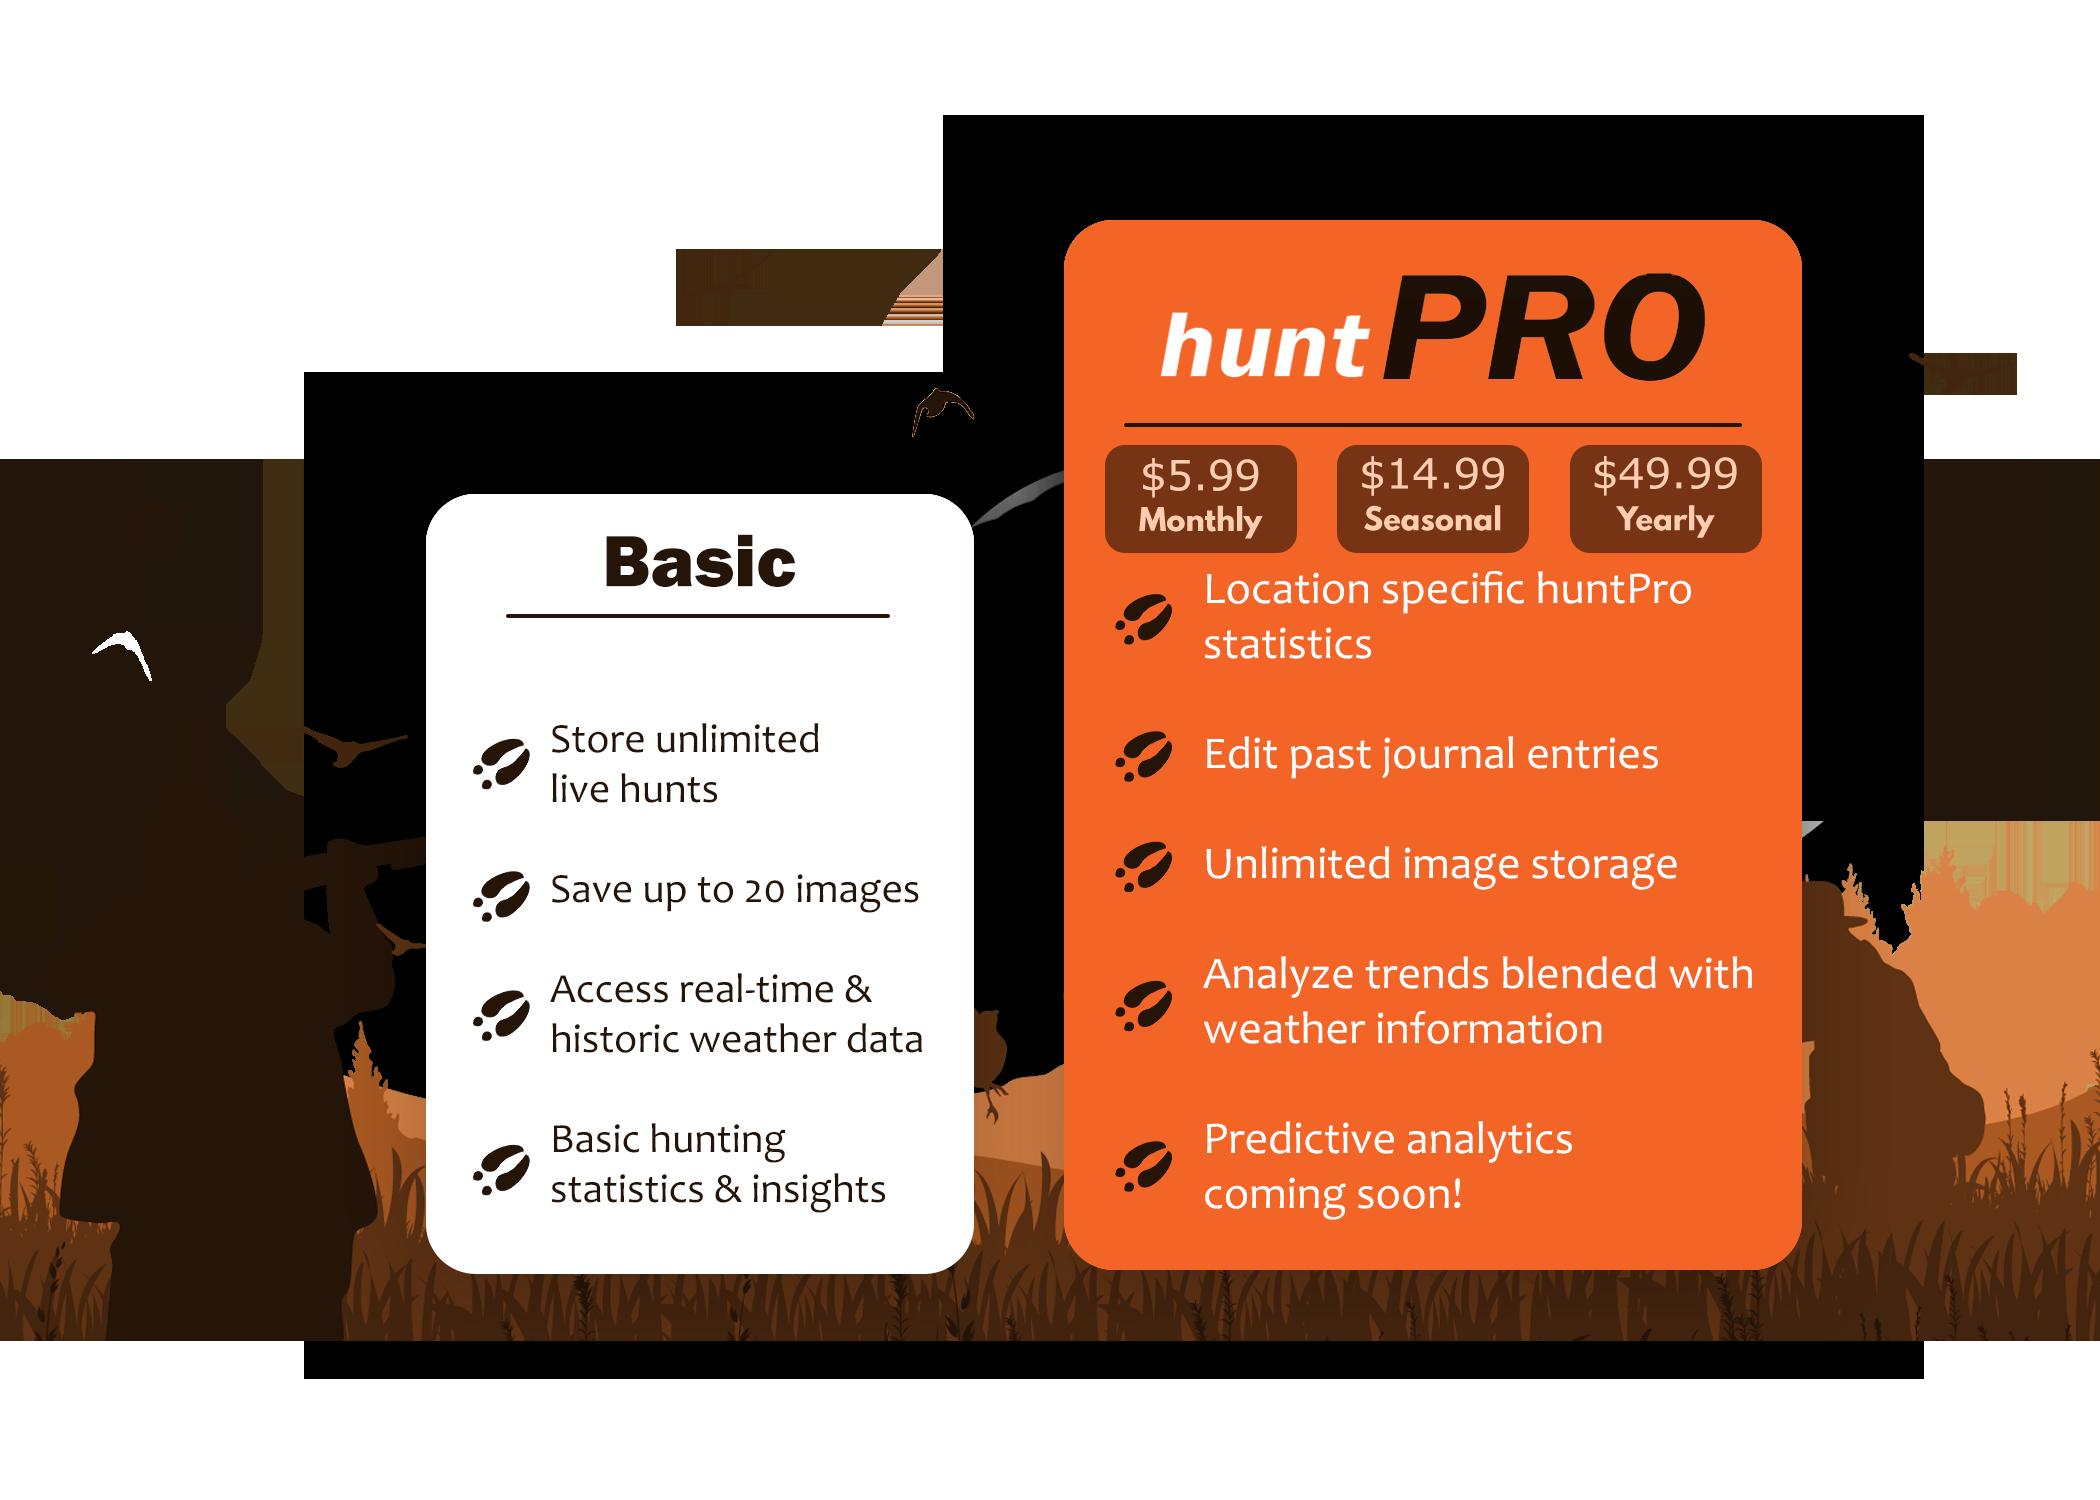 HuntPro vs Basic